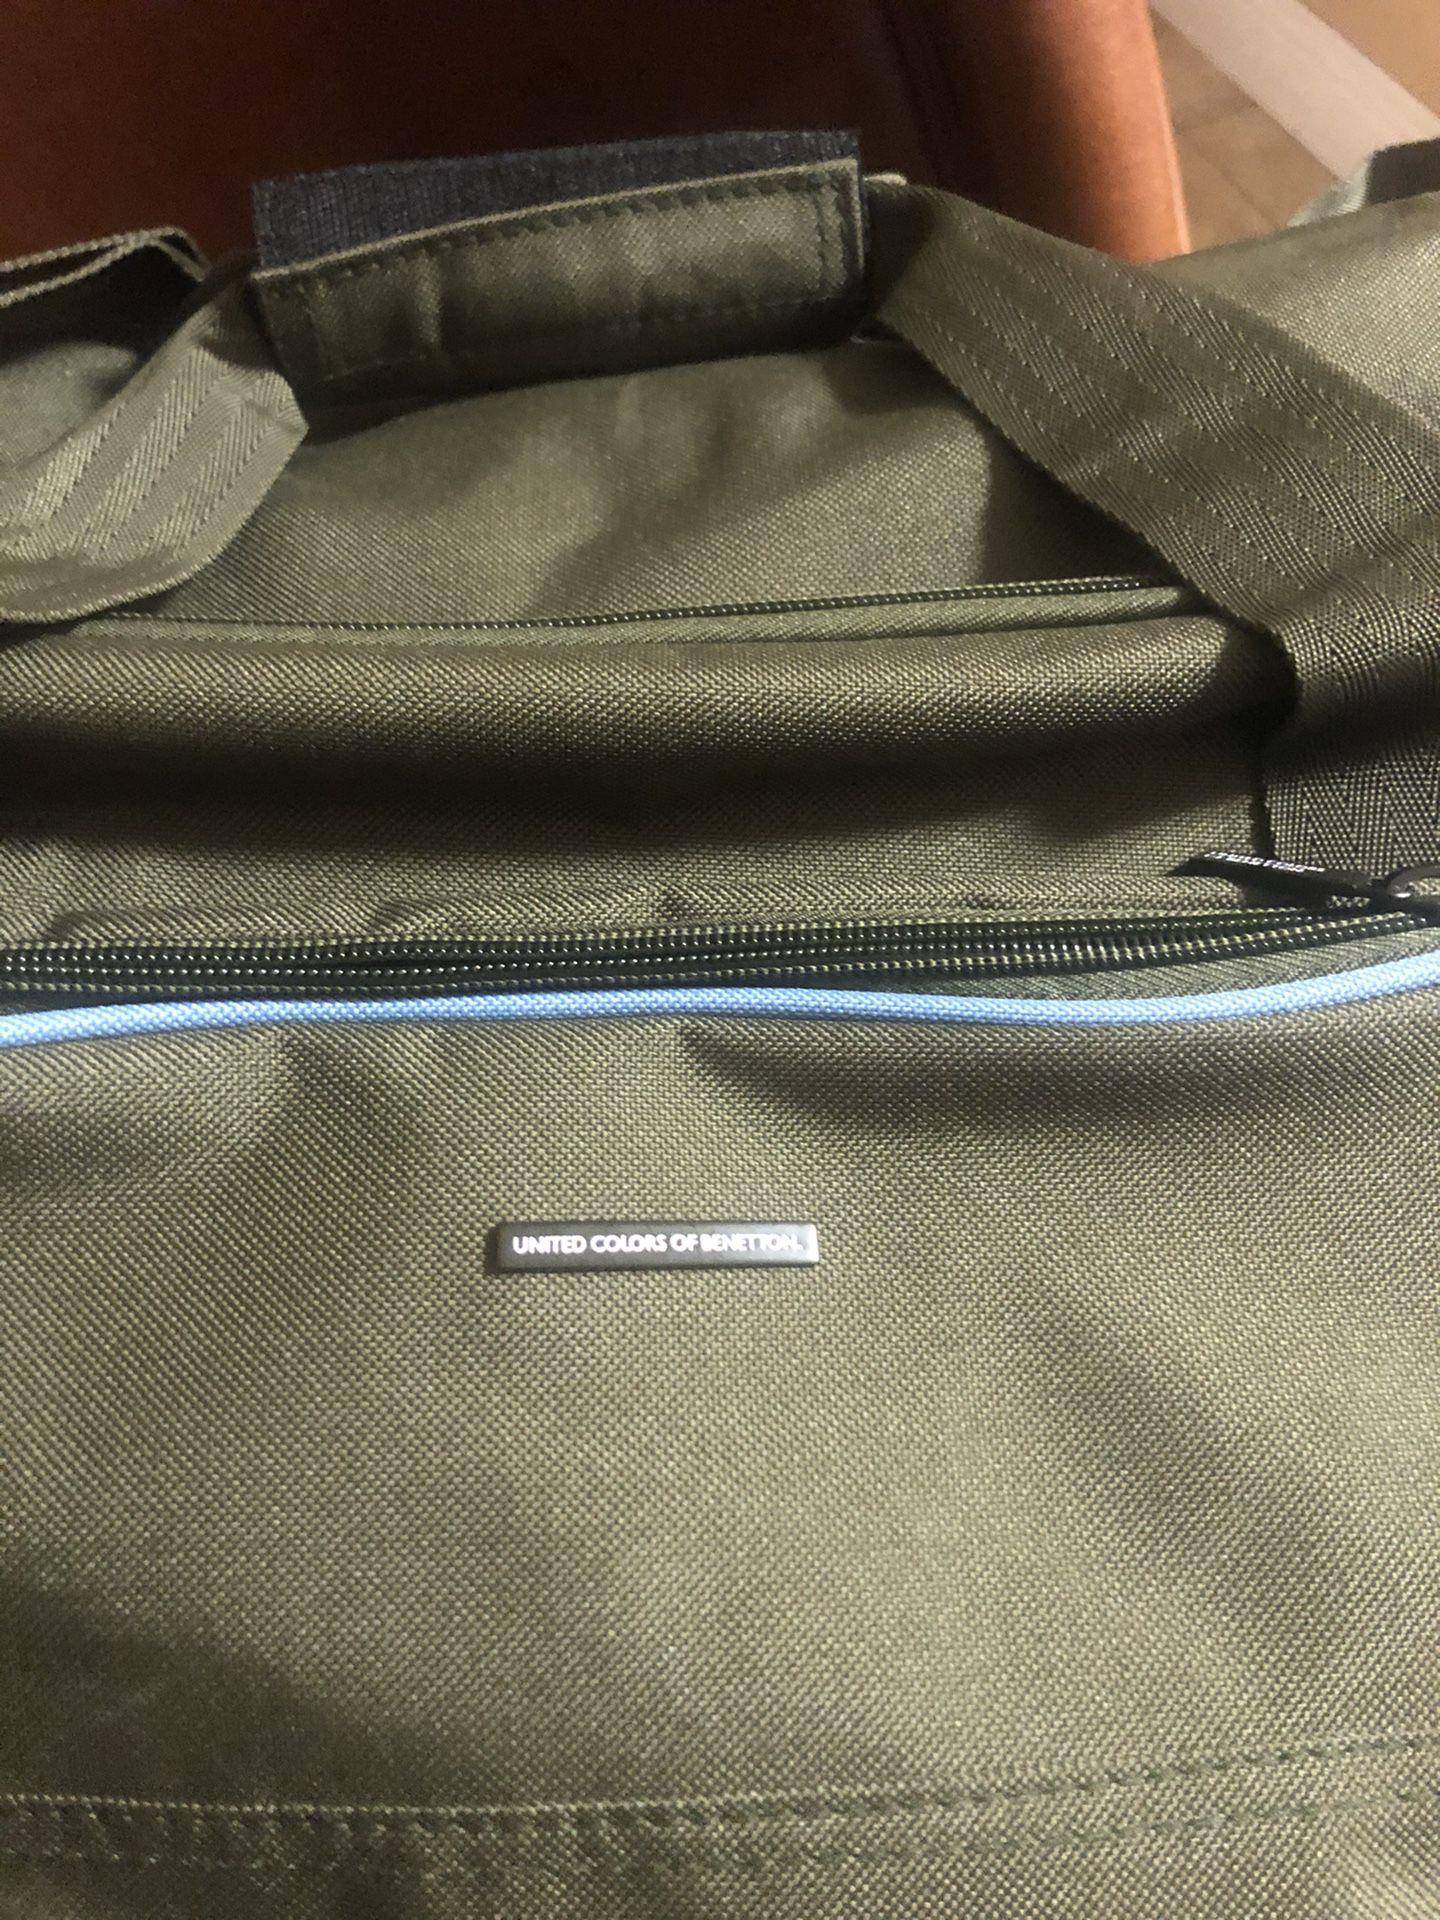 New Duffle Bag